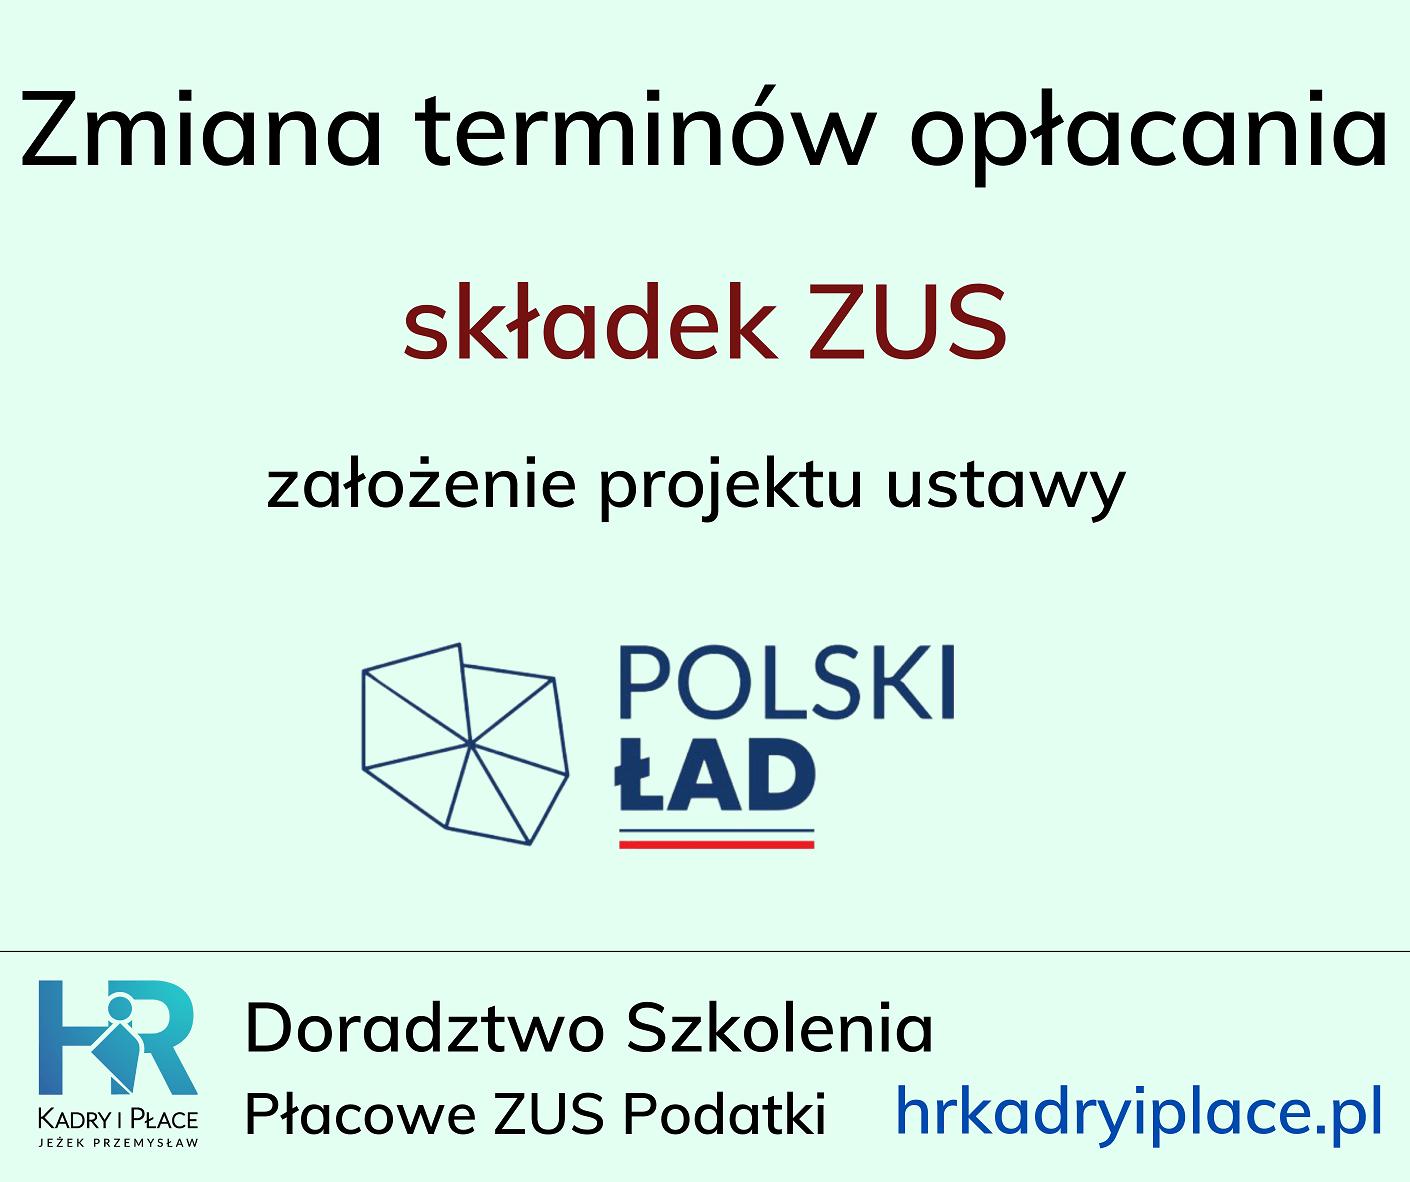 terminy zaplaty skladek zus polski lad